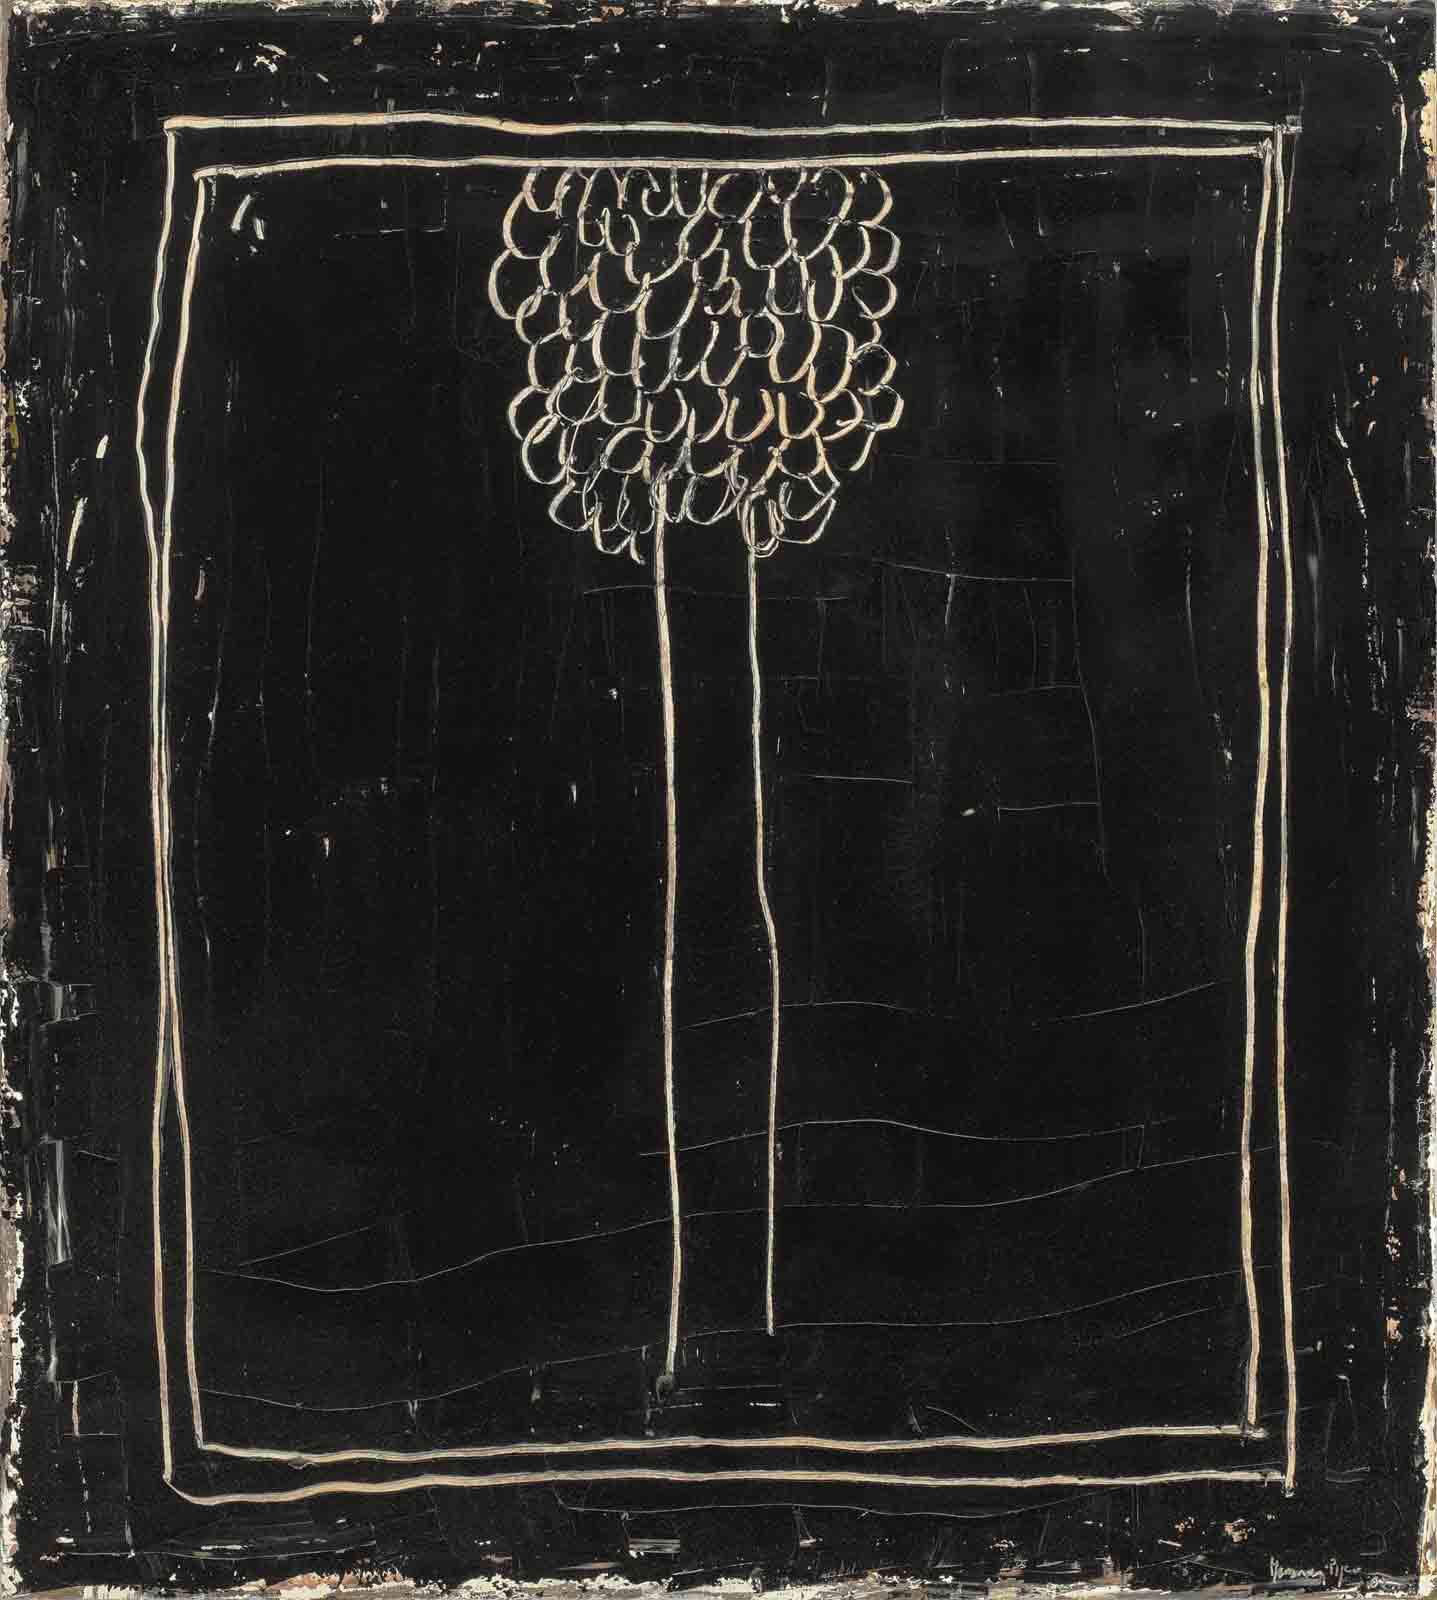 Xiprer Negre (Black Cypress)